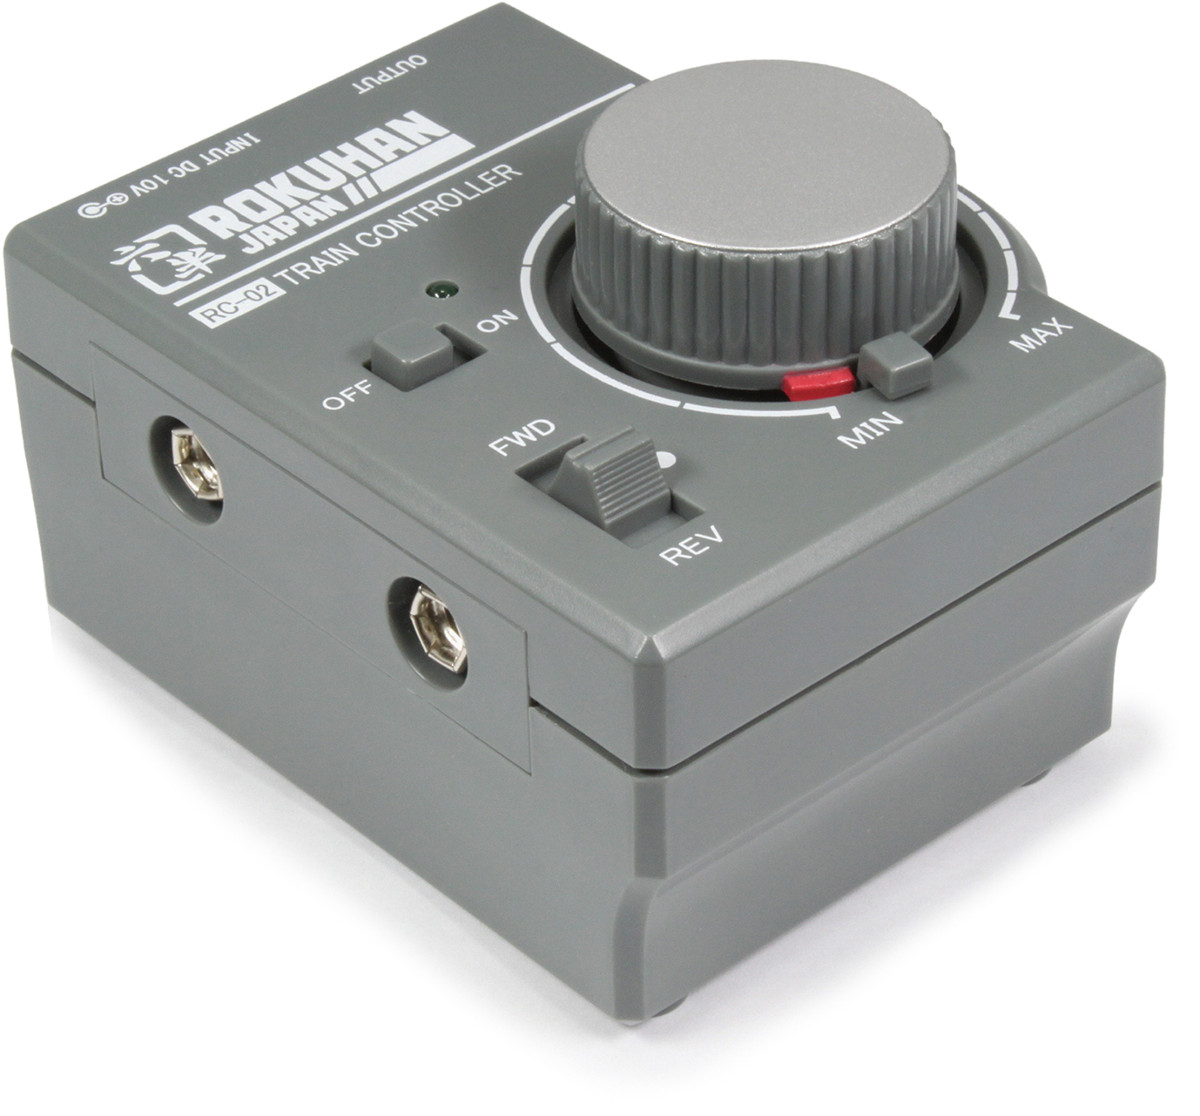 RC02 コンパクトトレインコントローラー